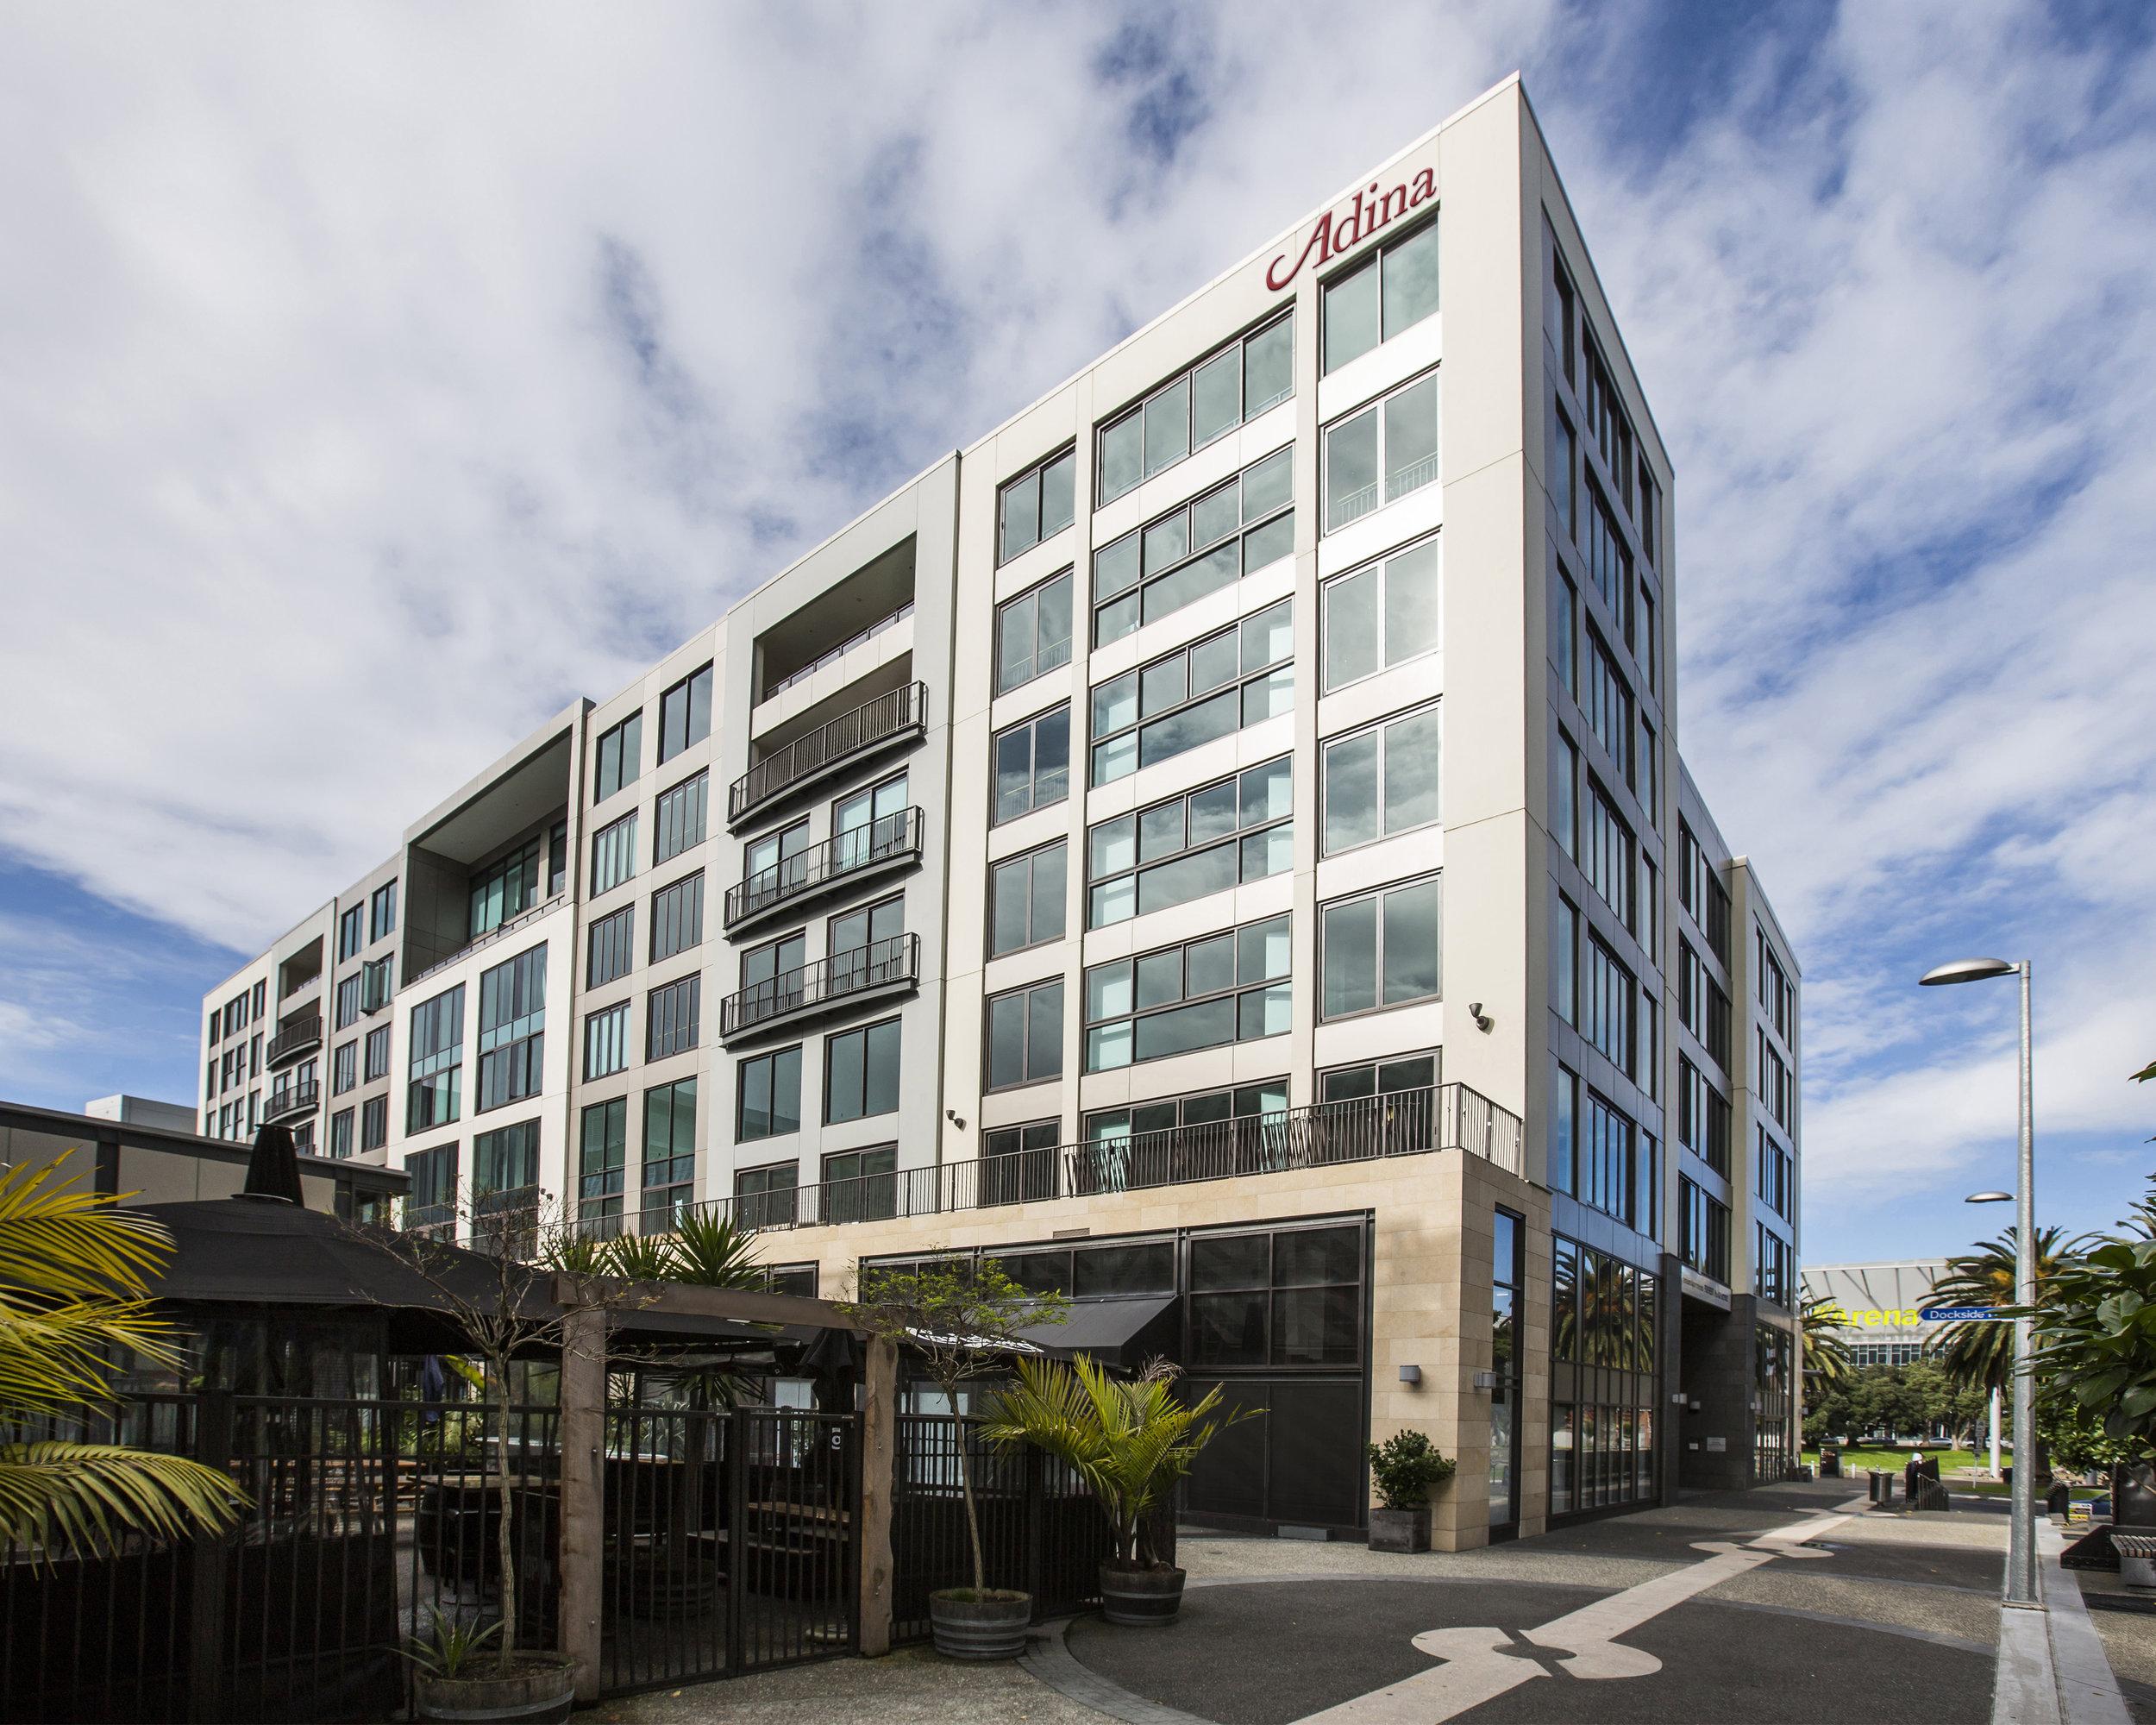 adina-apartment-hotel-auckland-britomart-exterior-01-2015.jpg